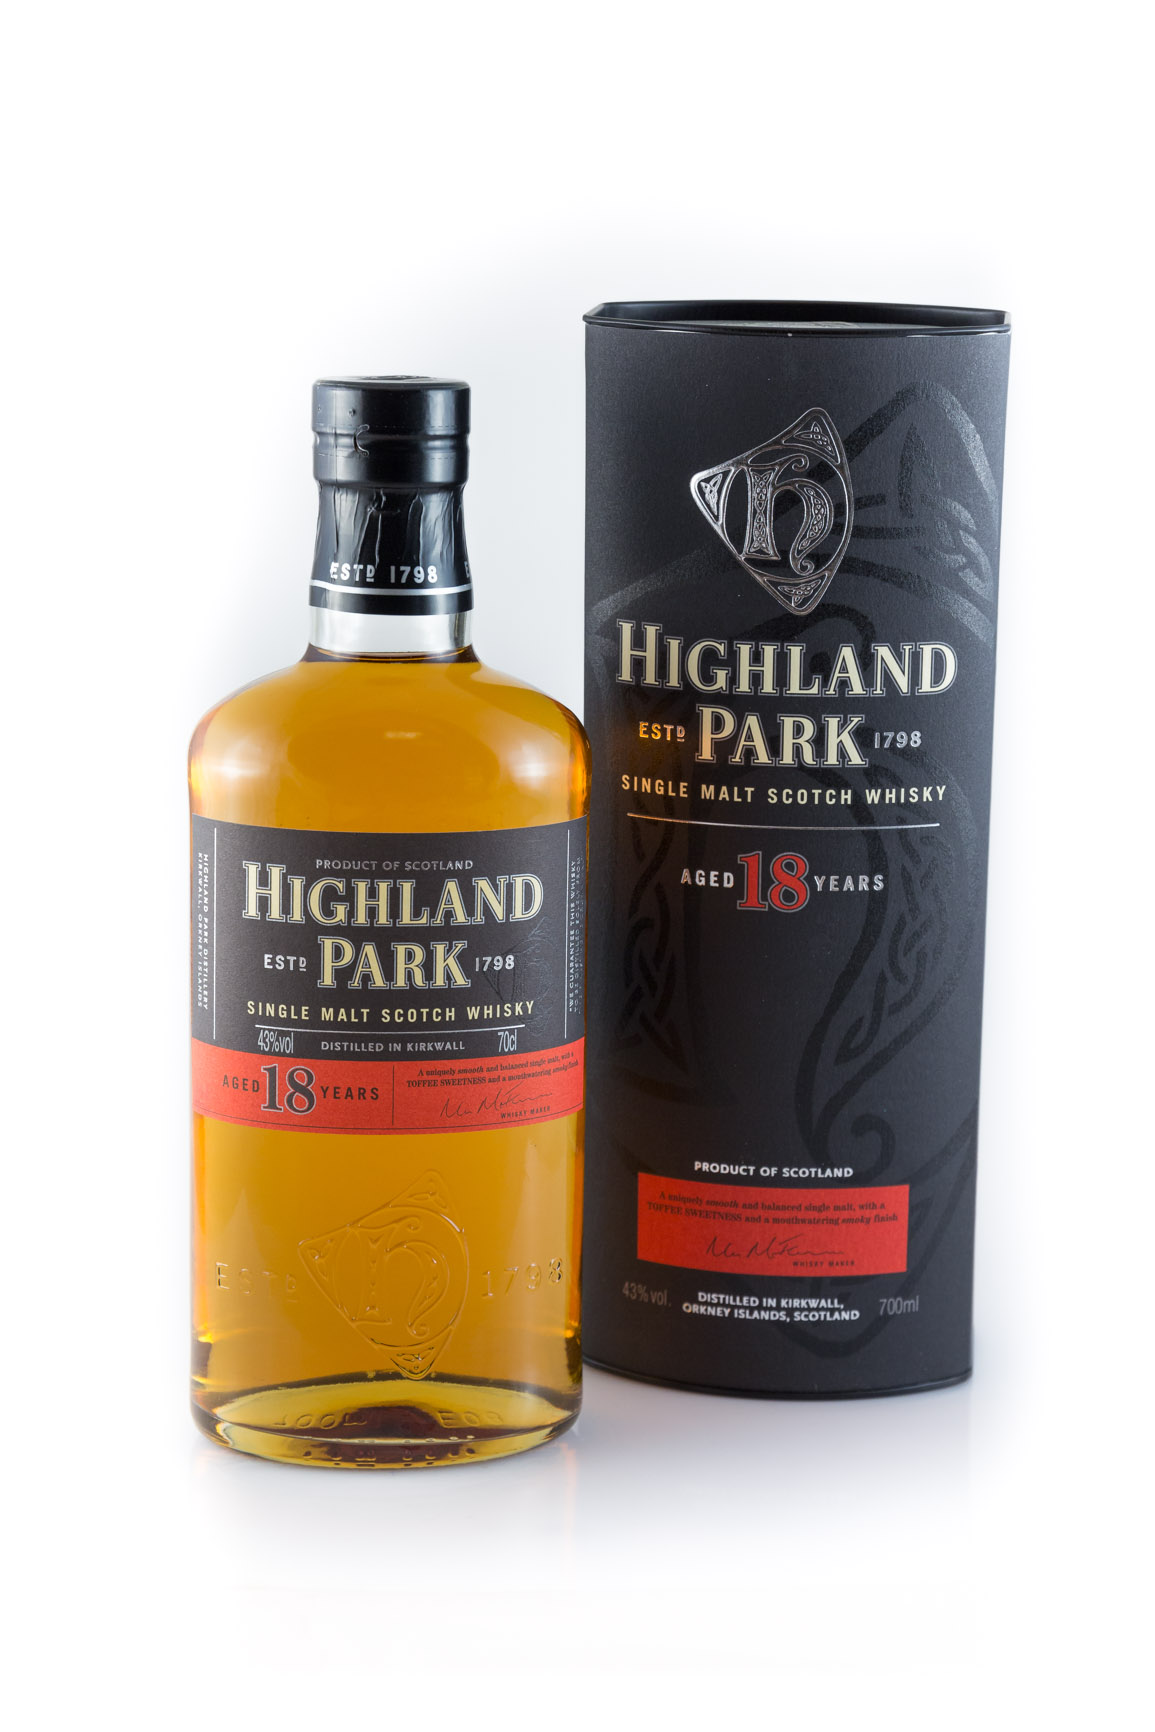 highland park whisky single malt scotch whisky kaufen conalco spirituosen online shop. Black Bedroom Furniture Sets. Home Design Ideas